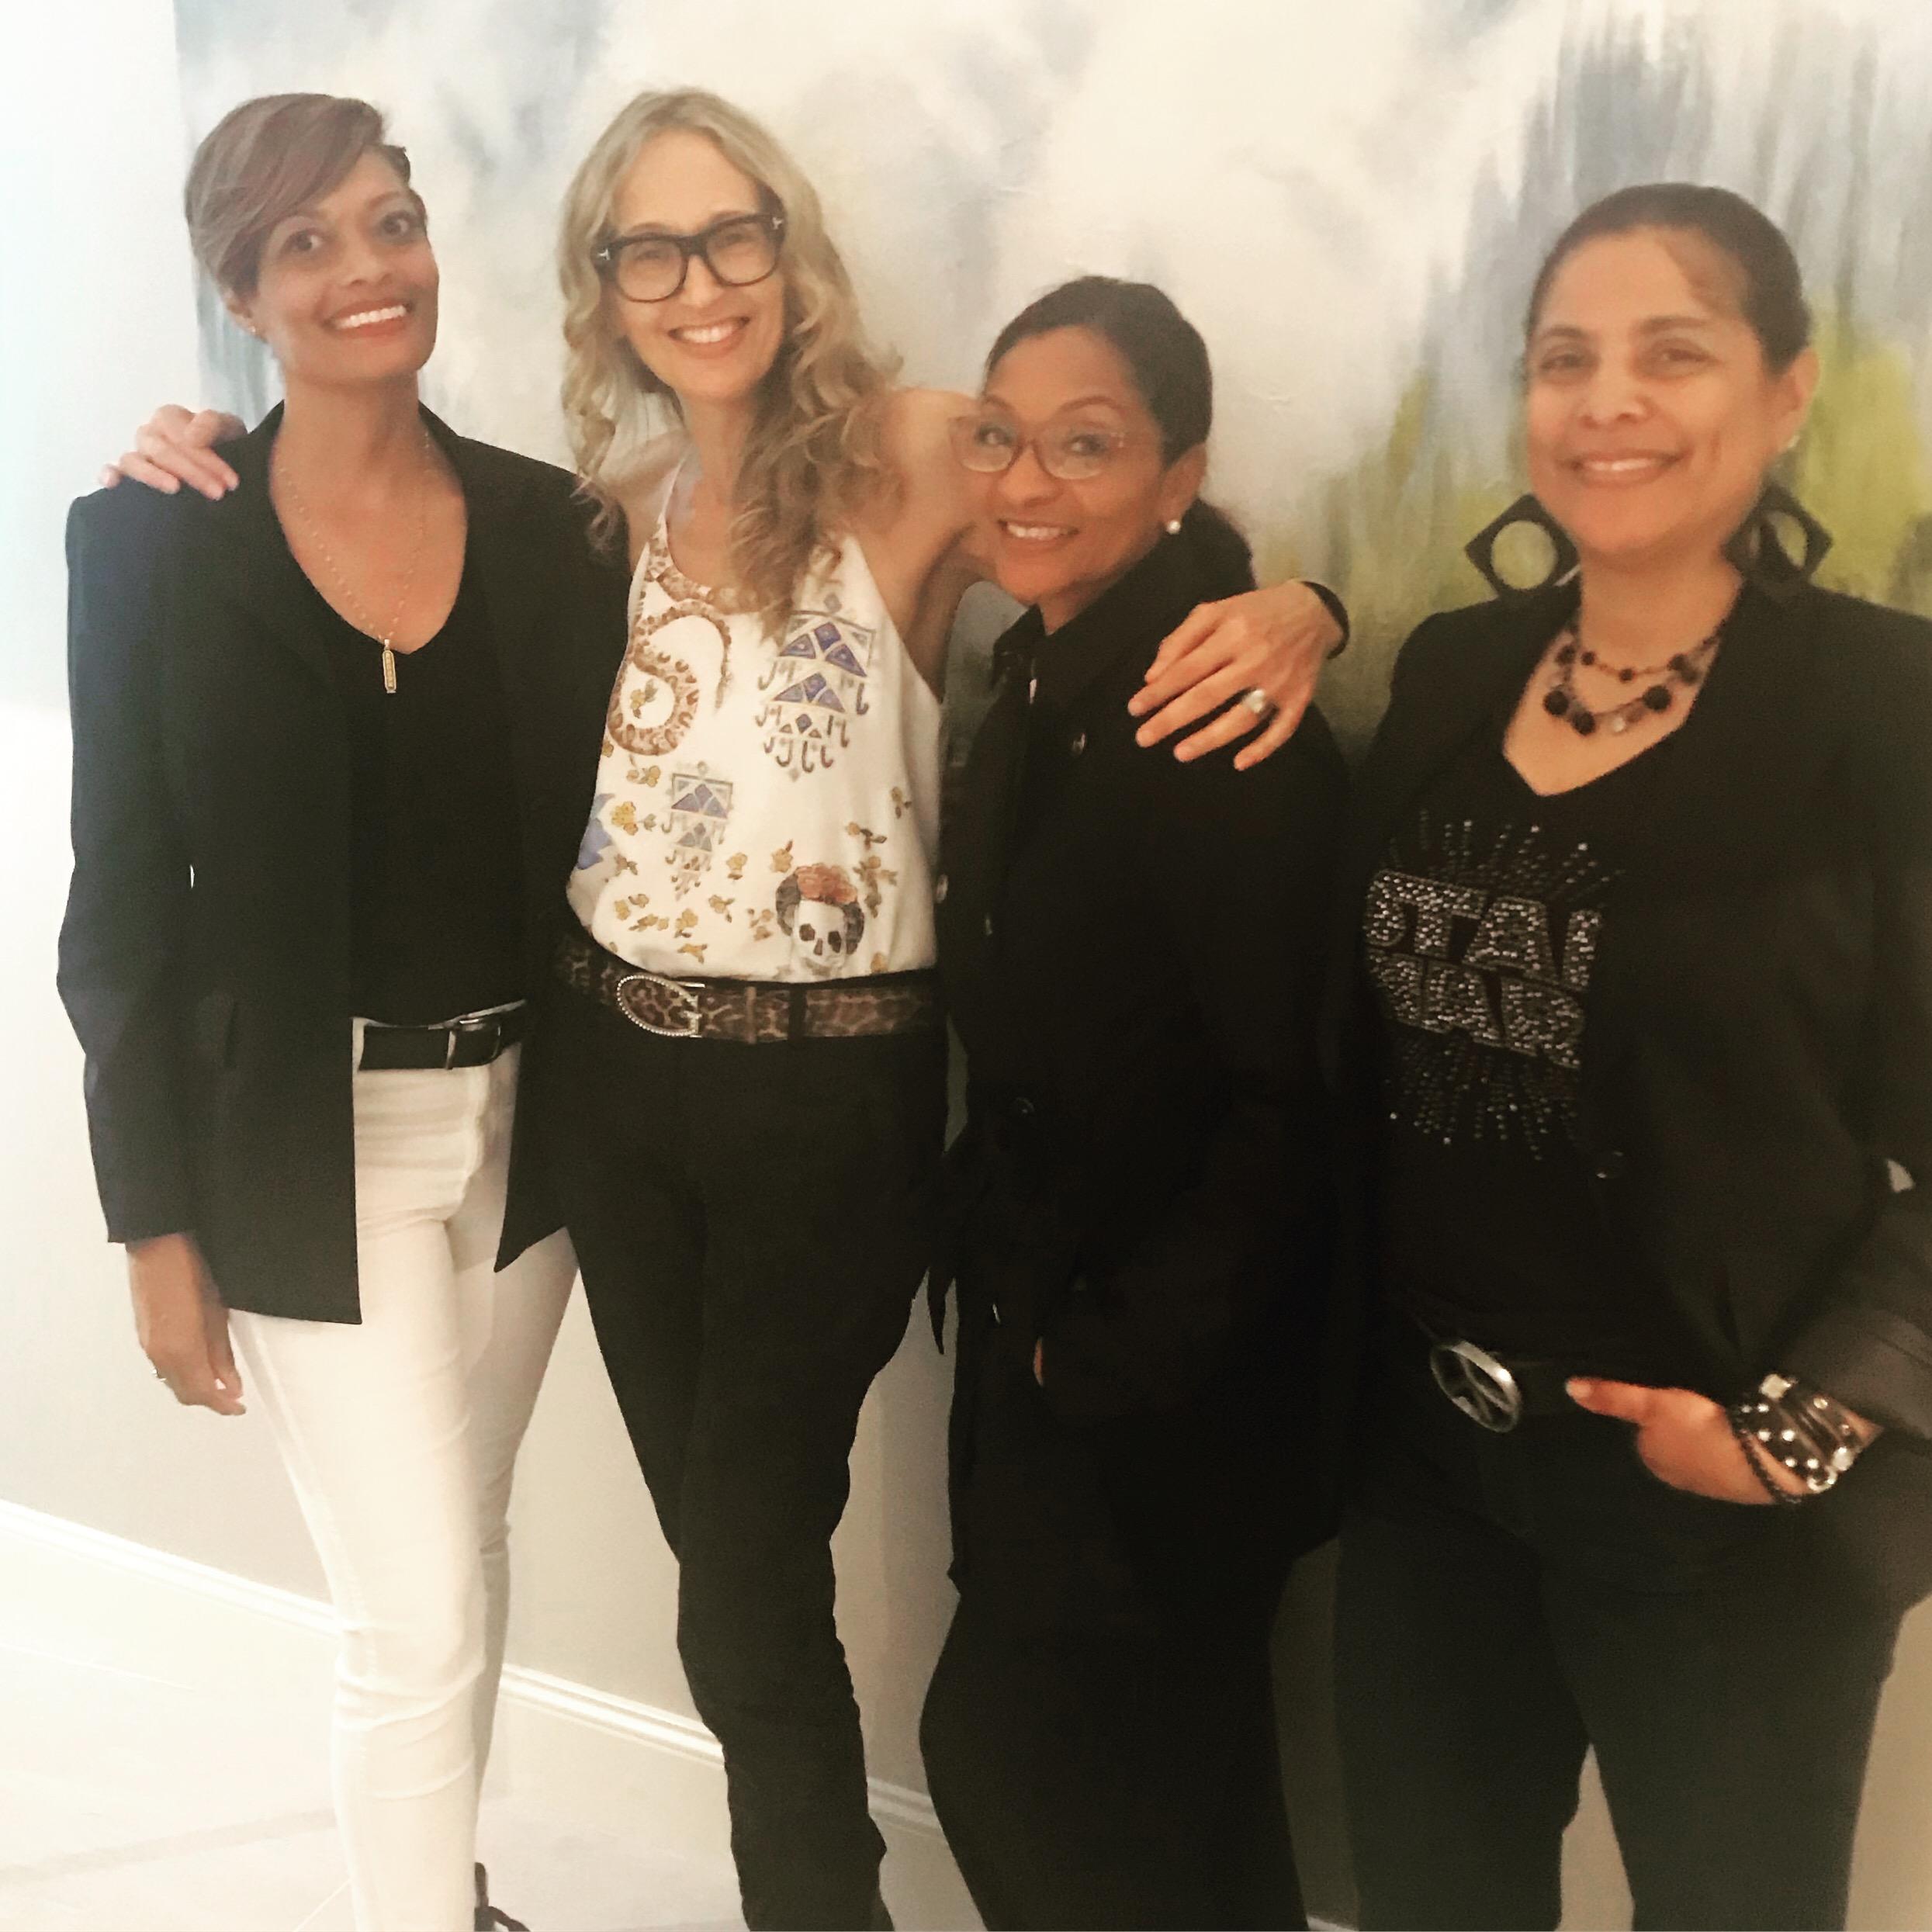 With Atlanta designers Rhonda, Marsha, and Cookie (whom I first met at ADAC and Americasmart)